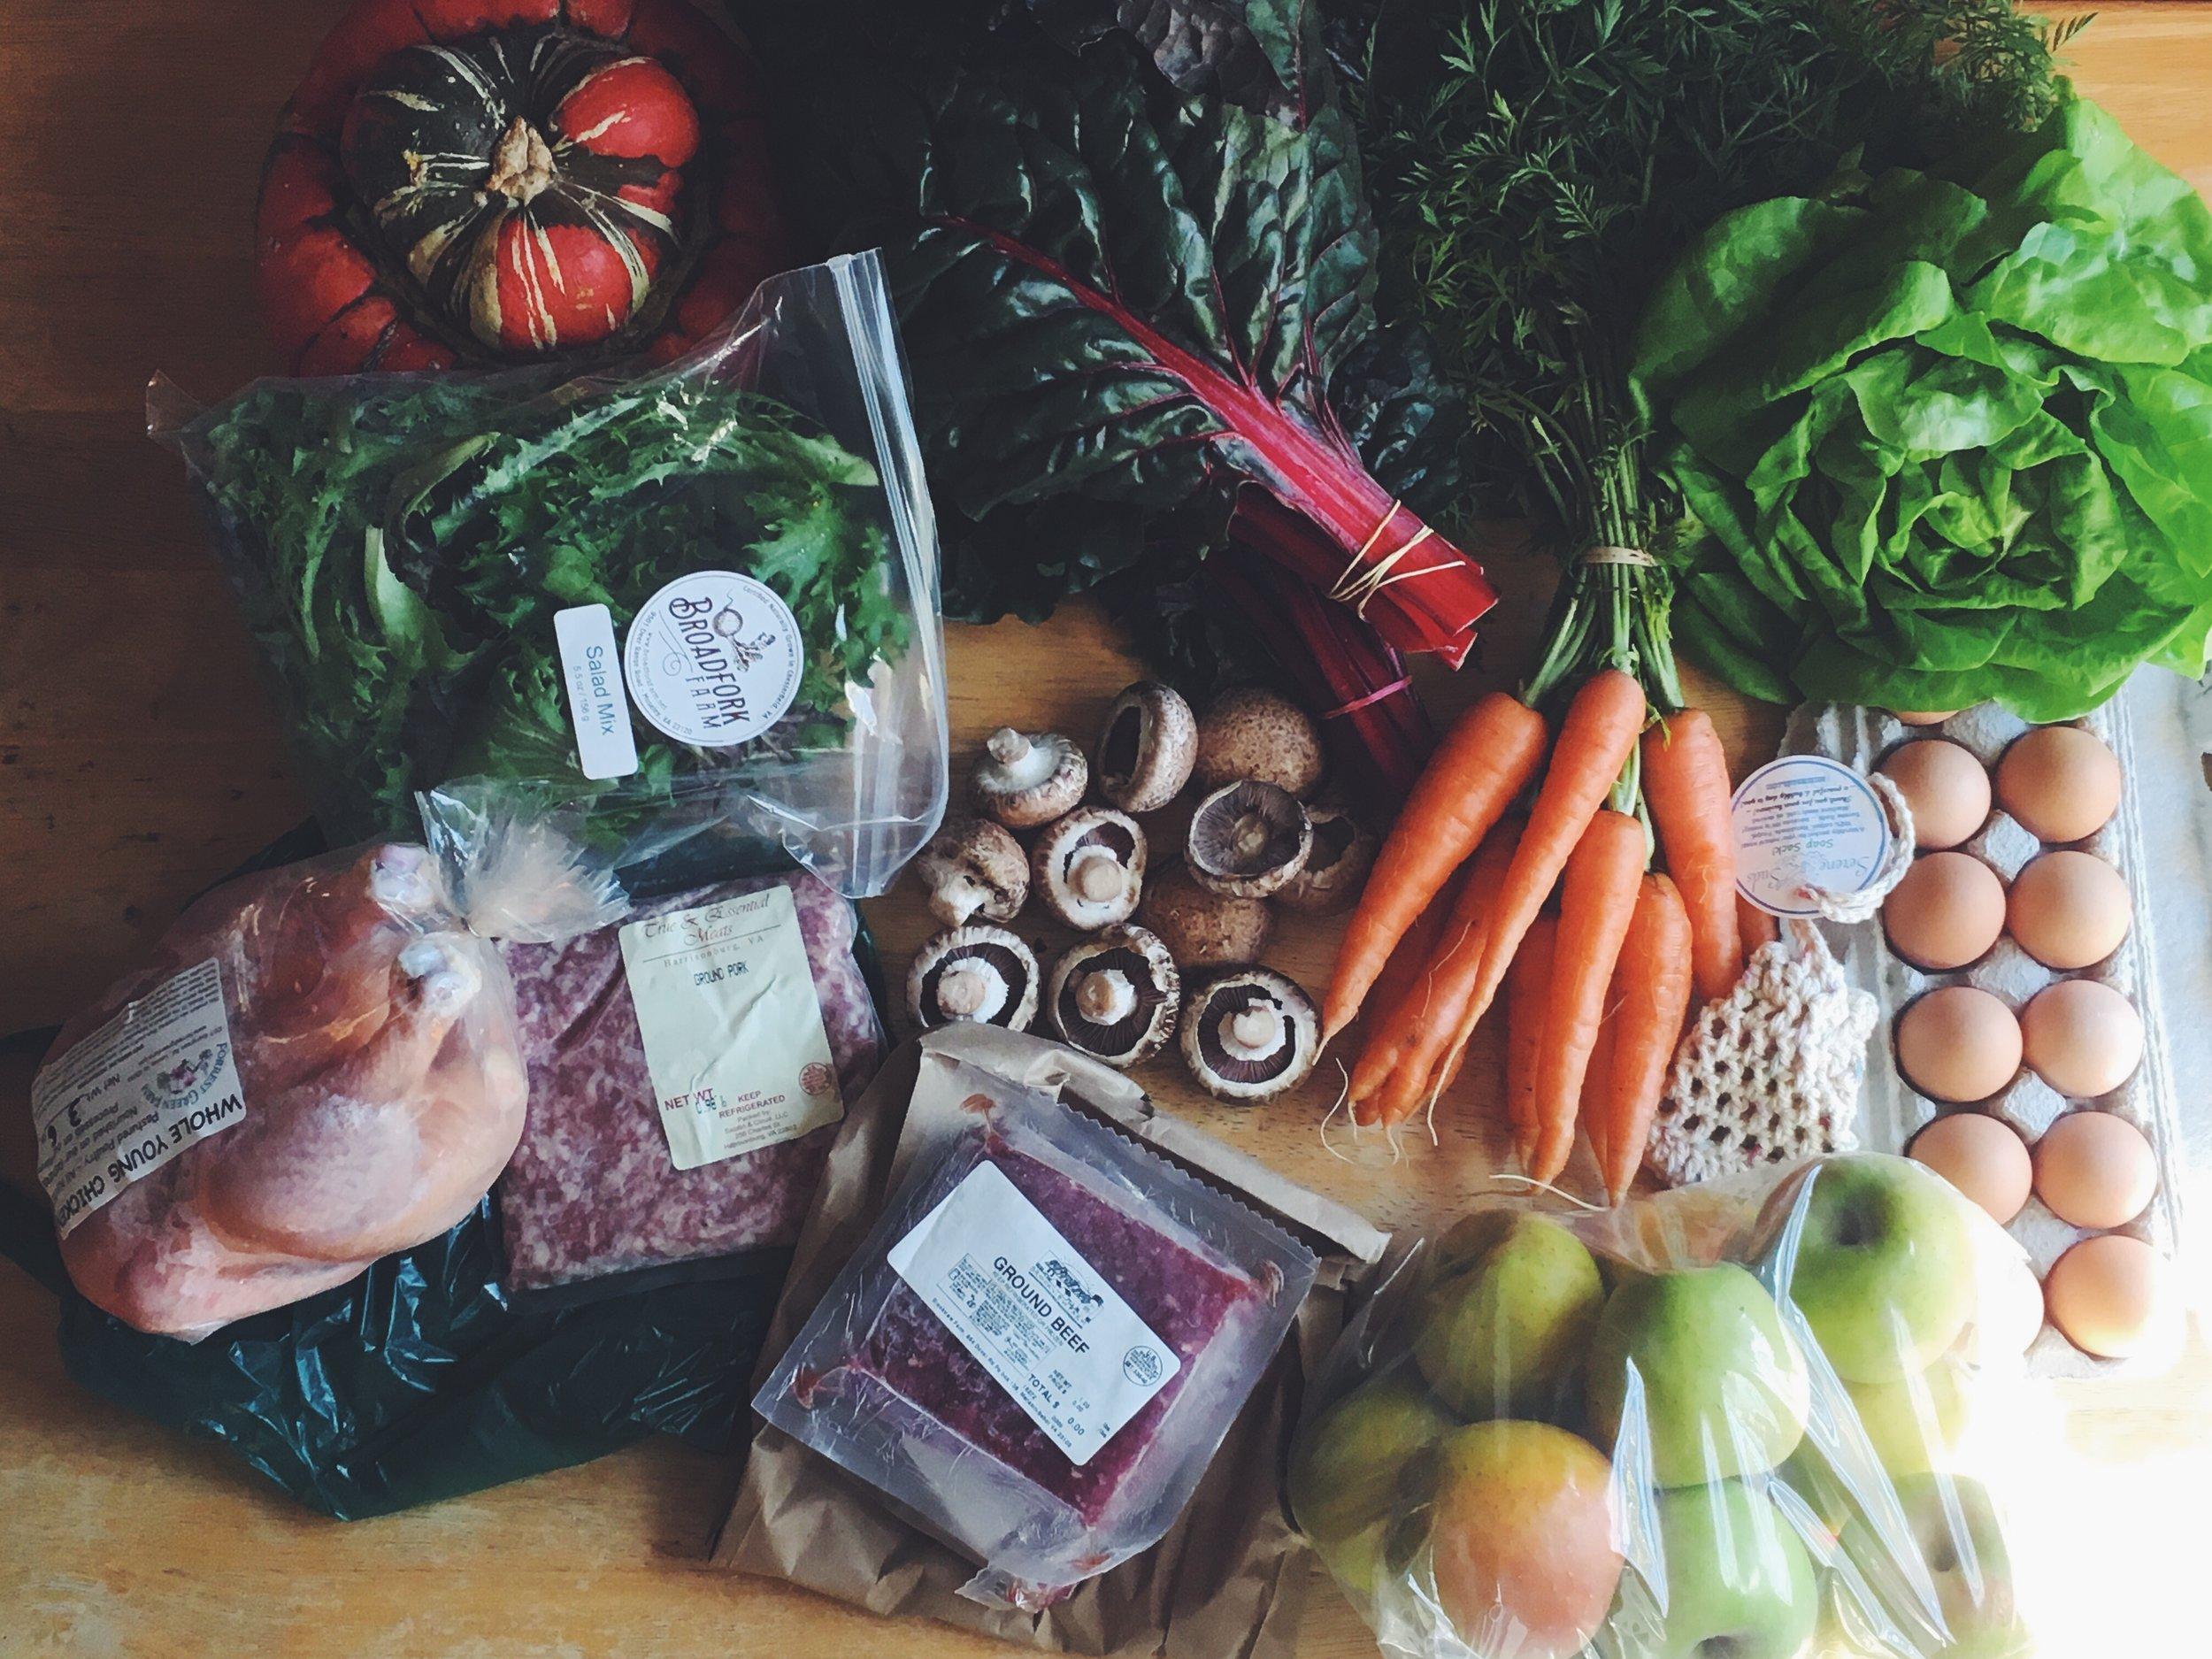 Online farmers market haul by Mary Delicate